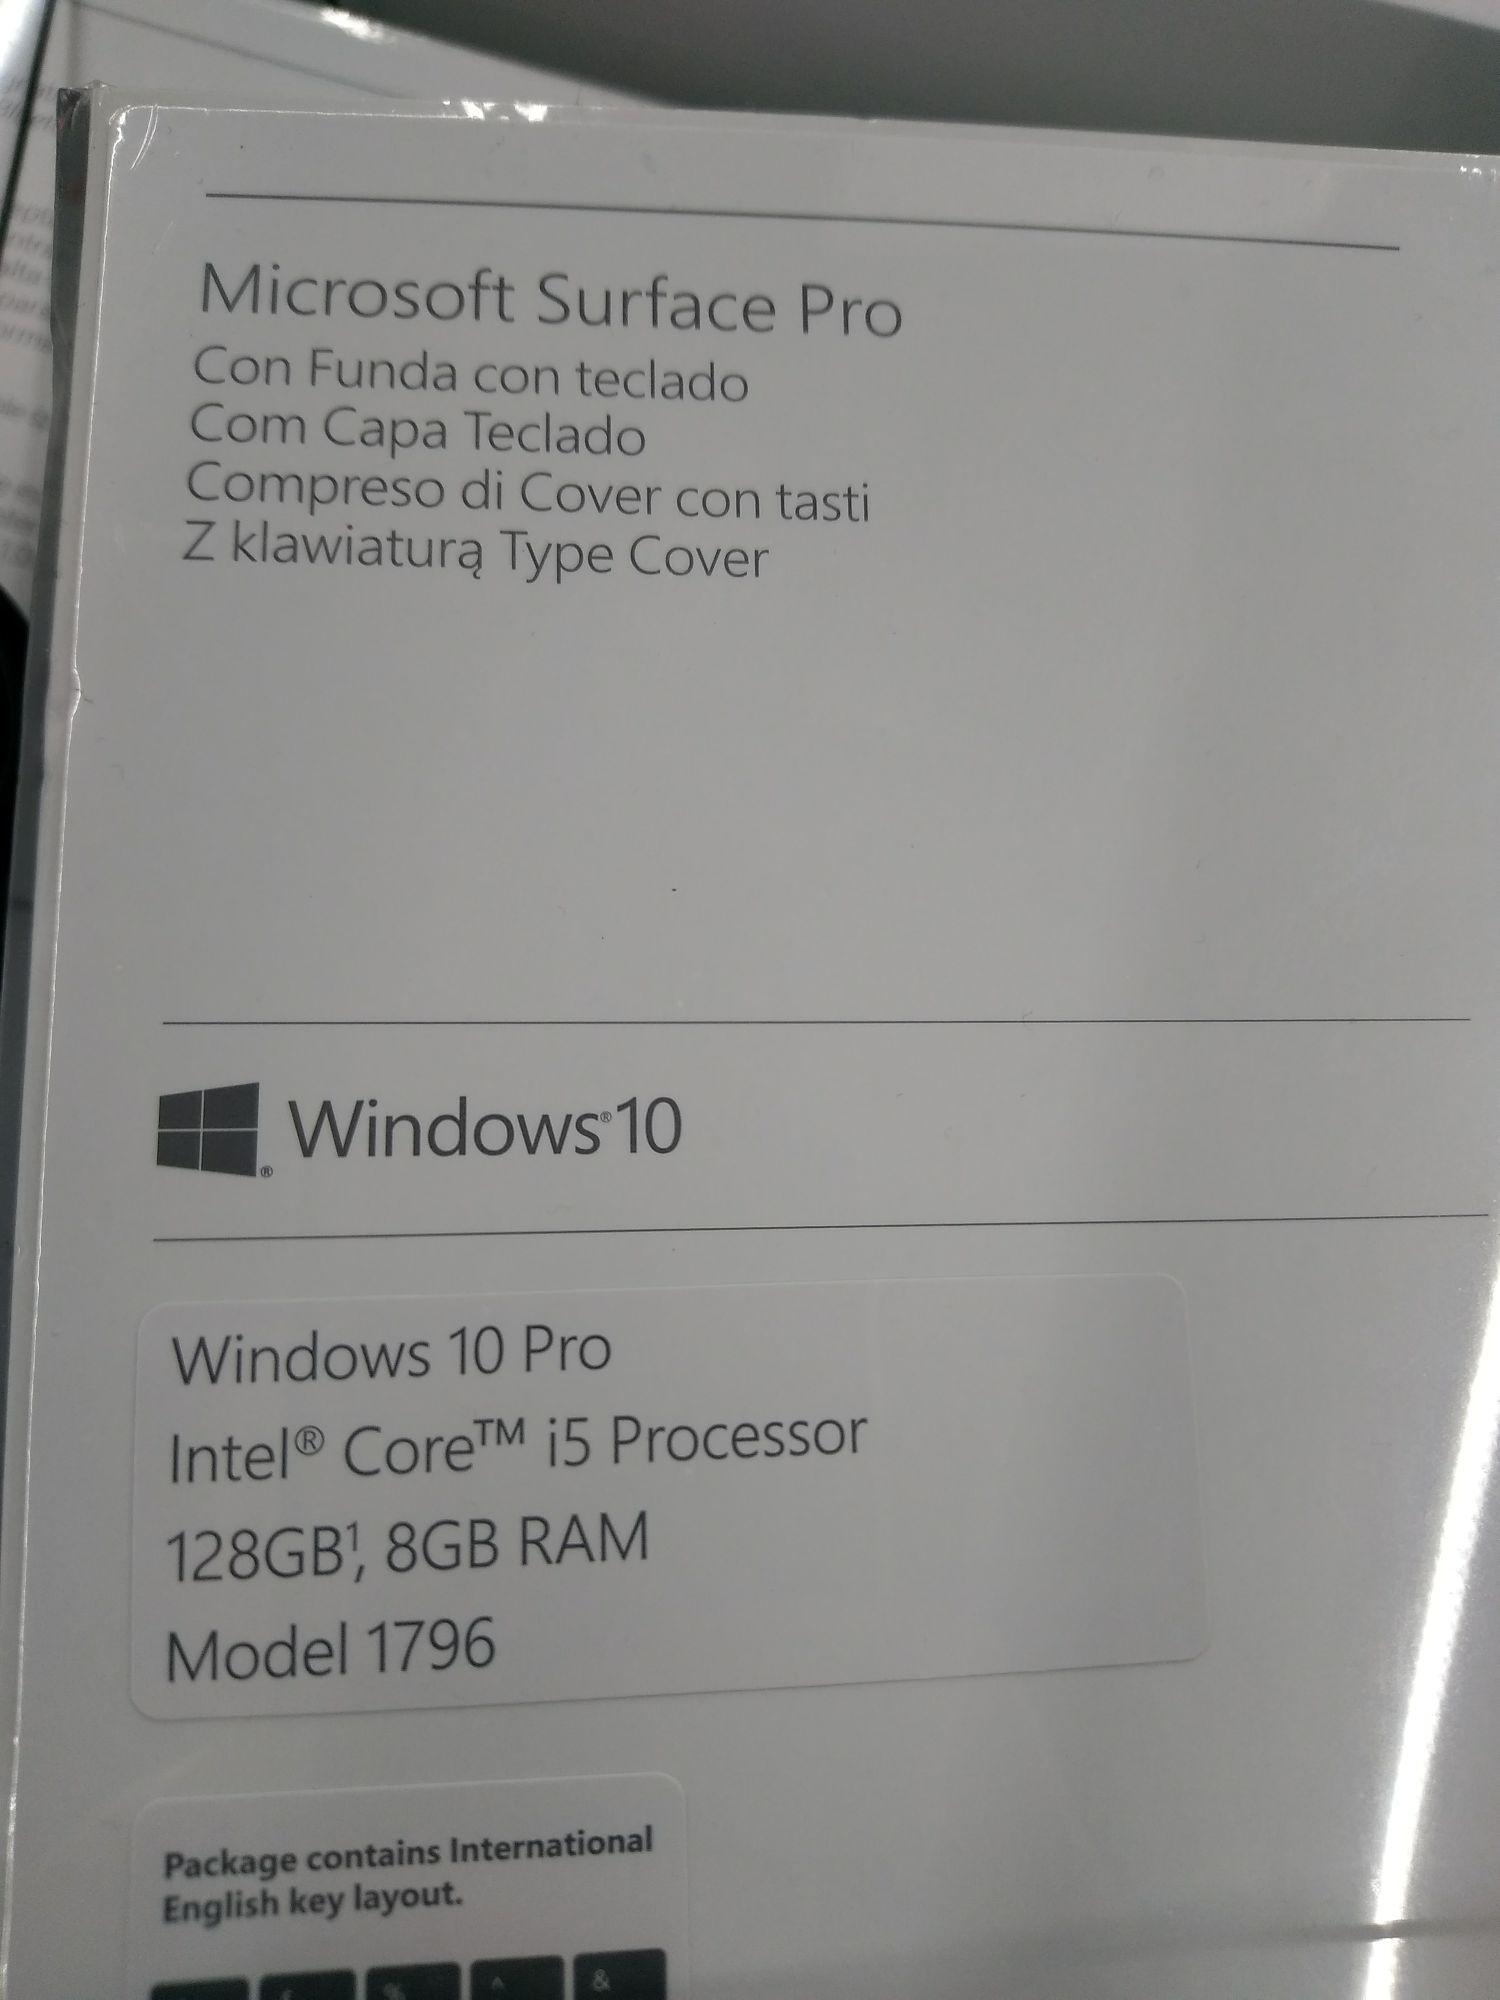 MediaMarkt G Krakowska Surface pro 5 i5-7200u /8gb ram/120 SSD+klawiatura+drukarka